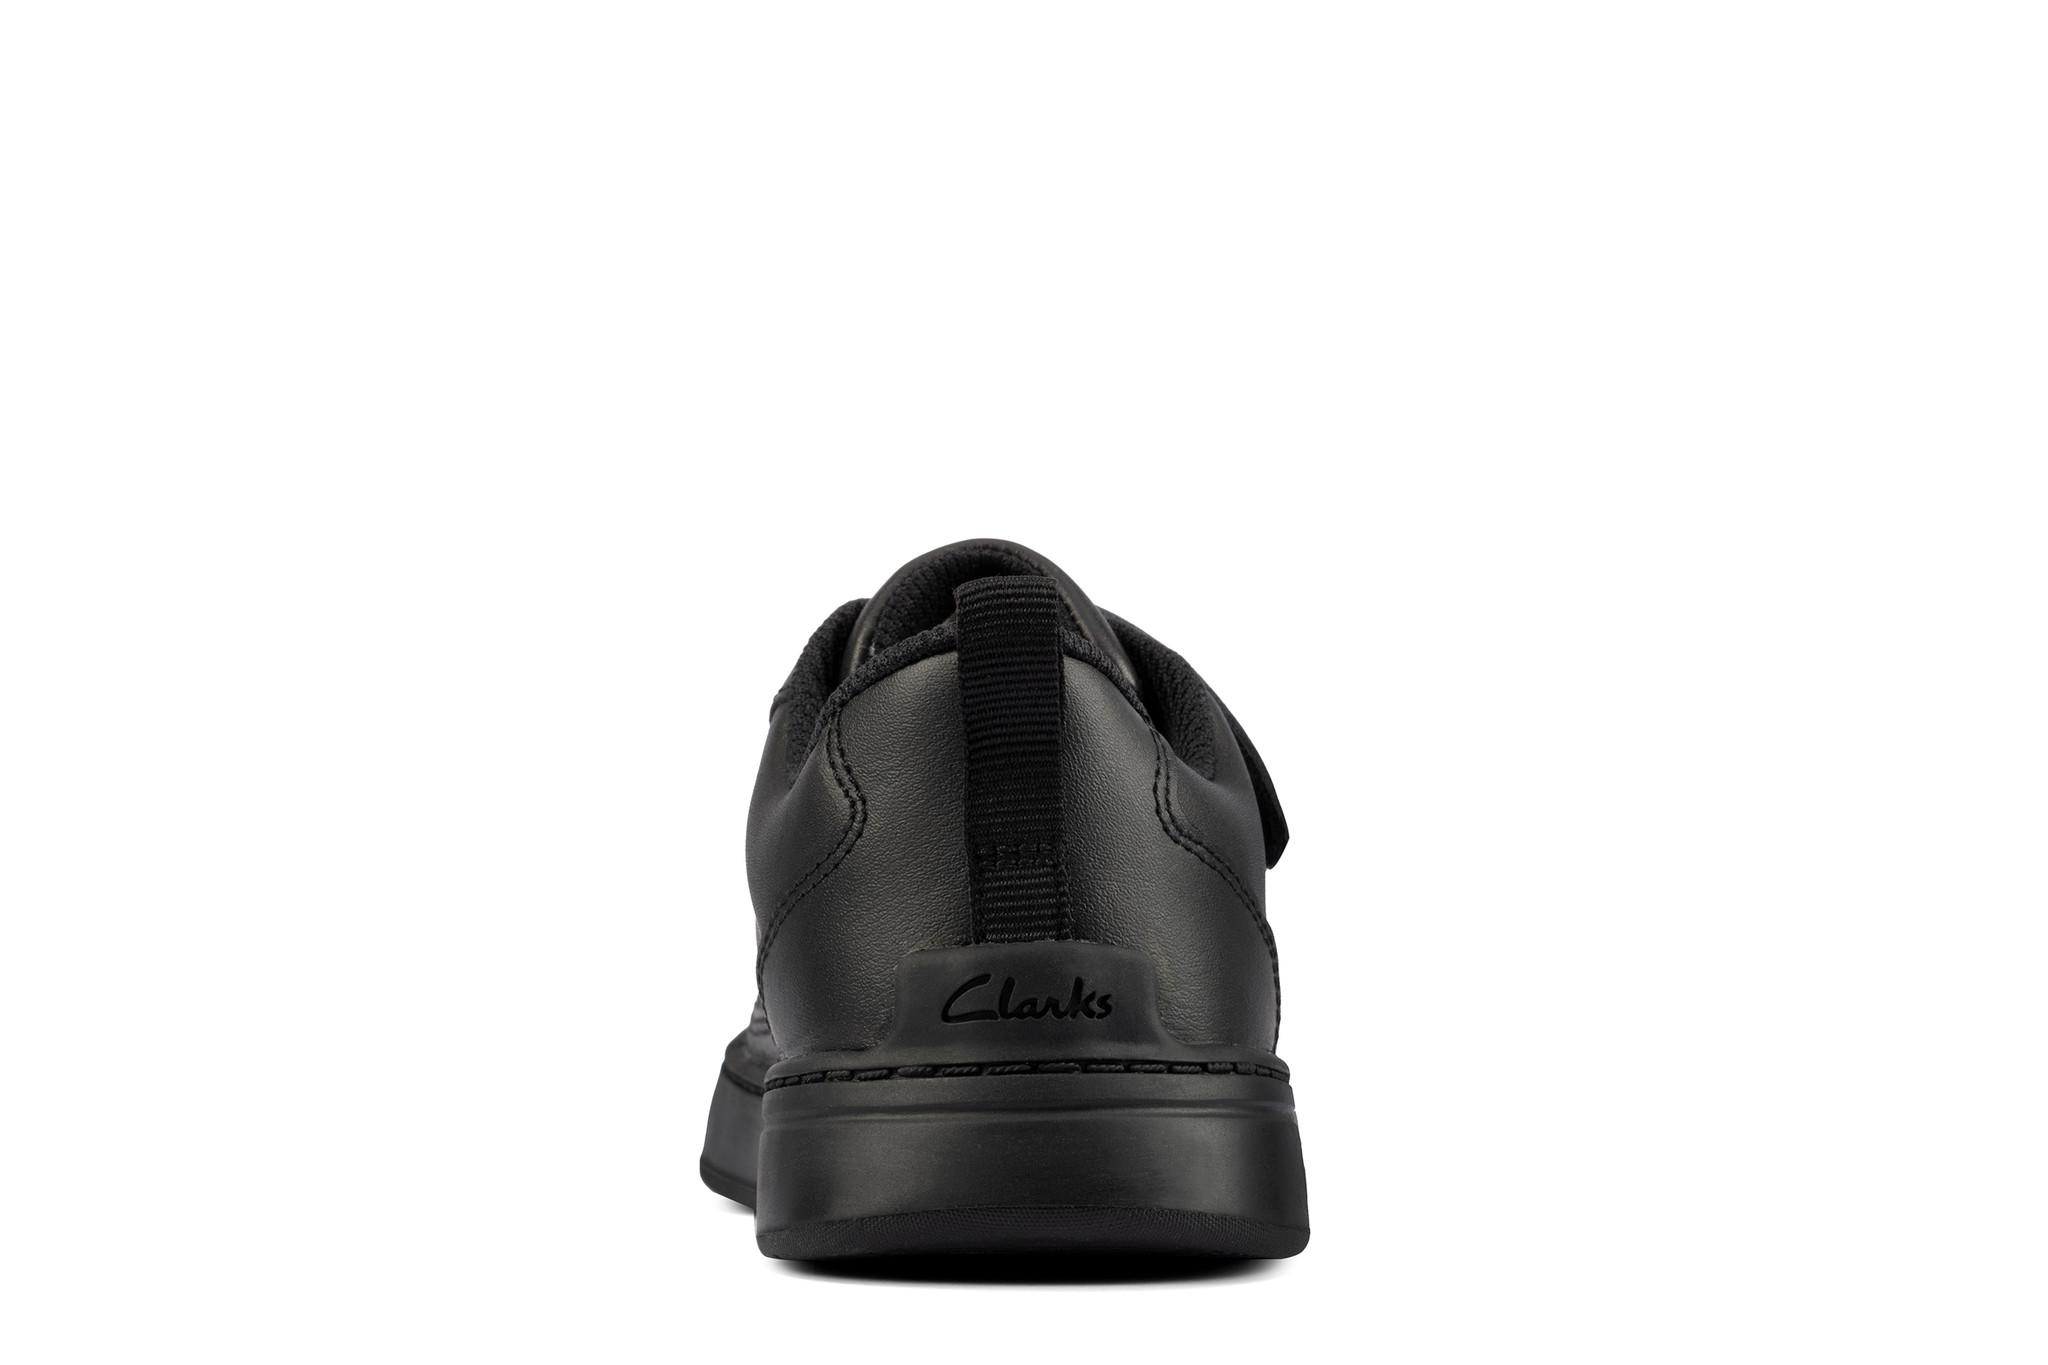 Clarks Vibrant Glow K Leather